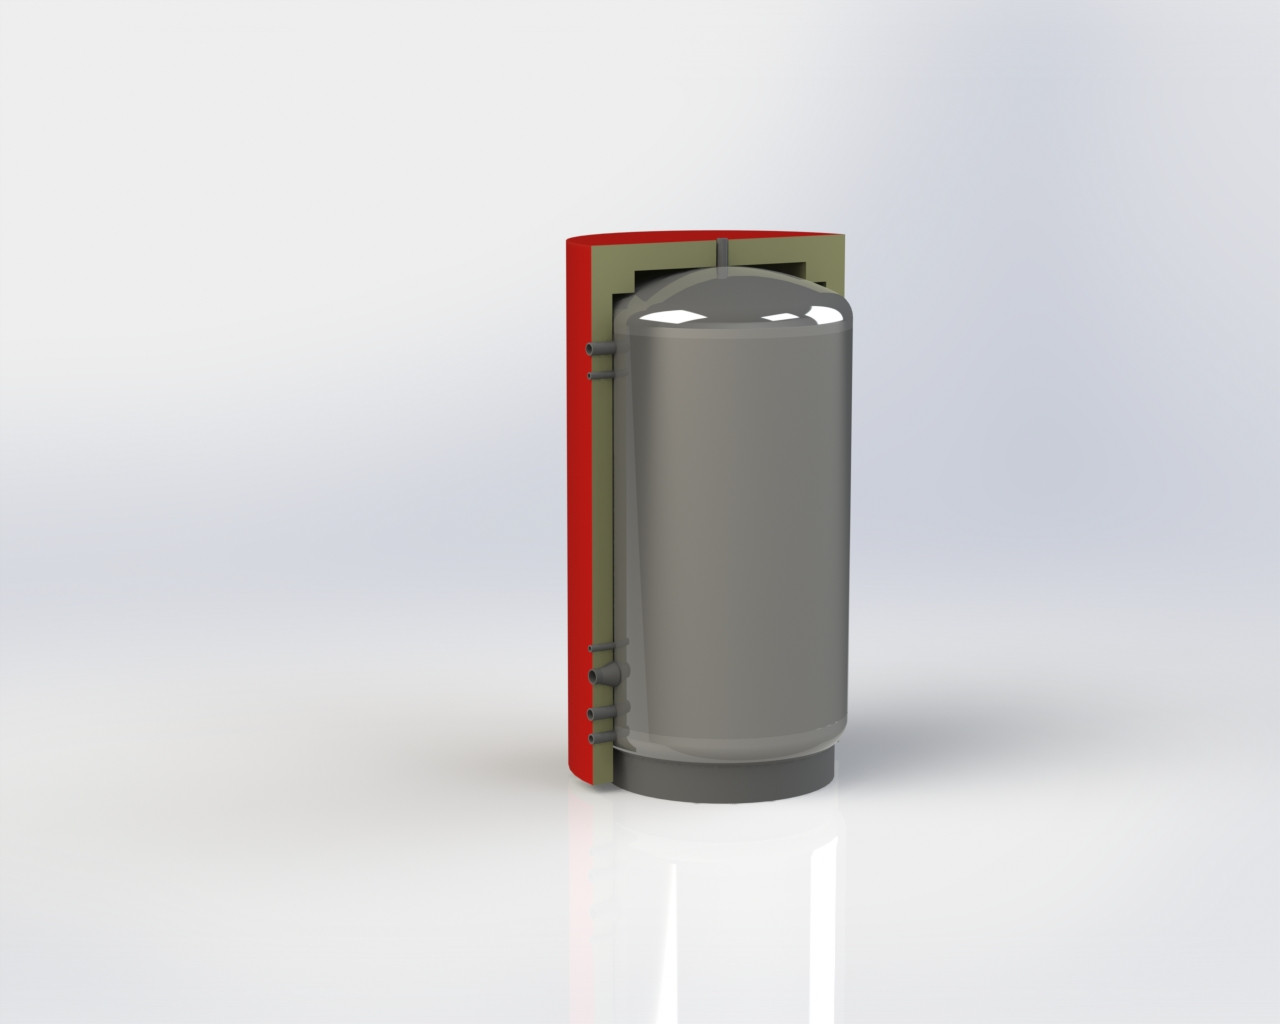 Теплоаккумулятор ЕАМ-00-1500 с изоляцией